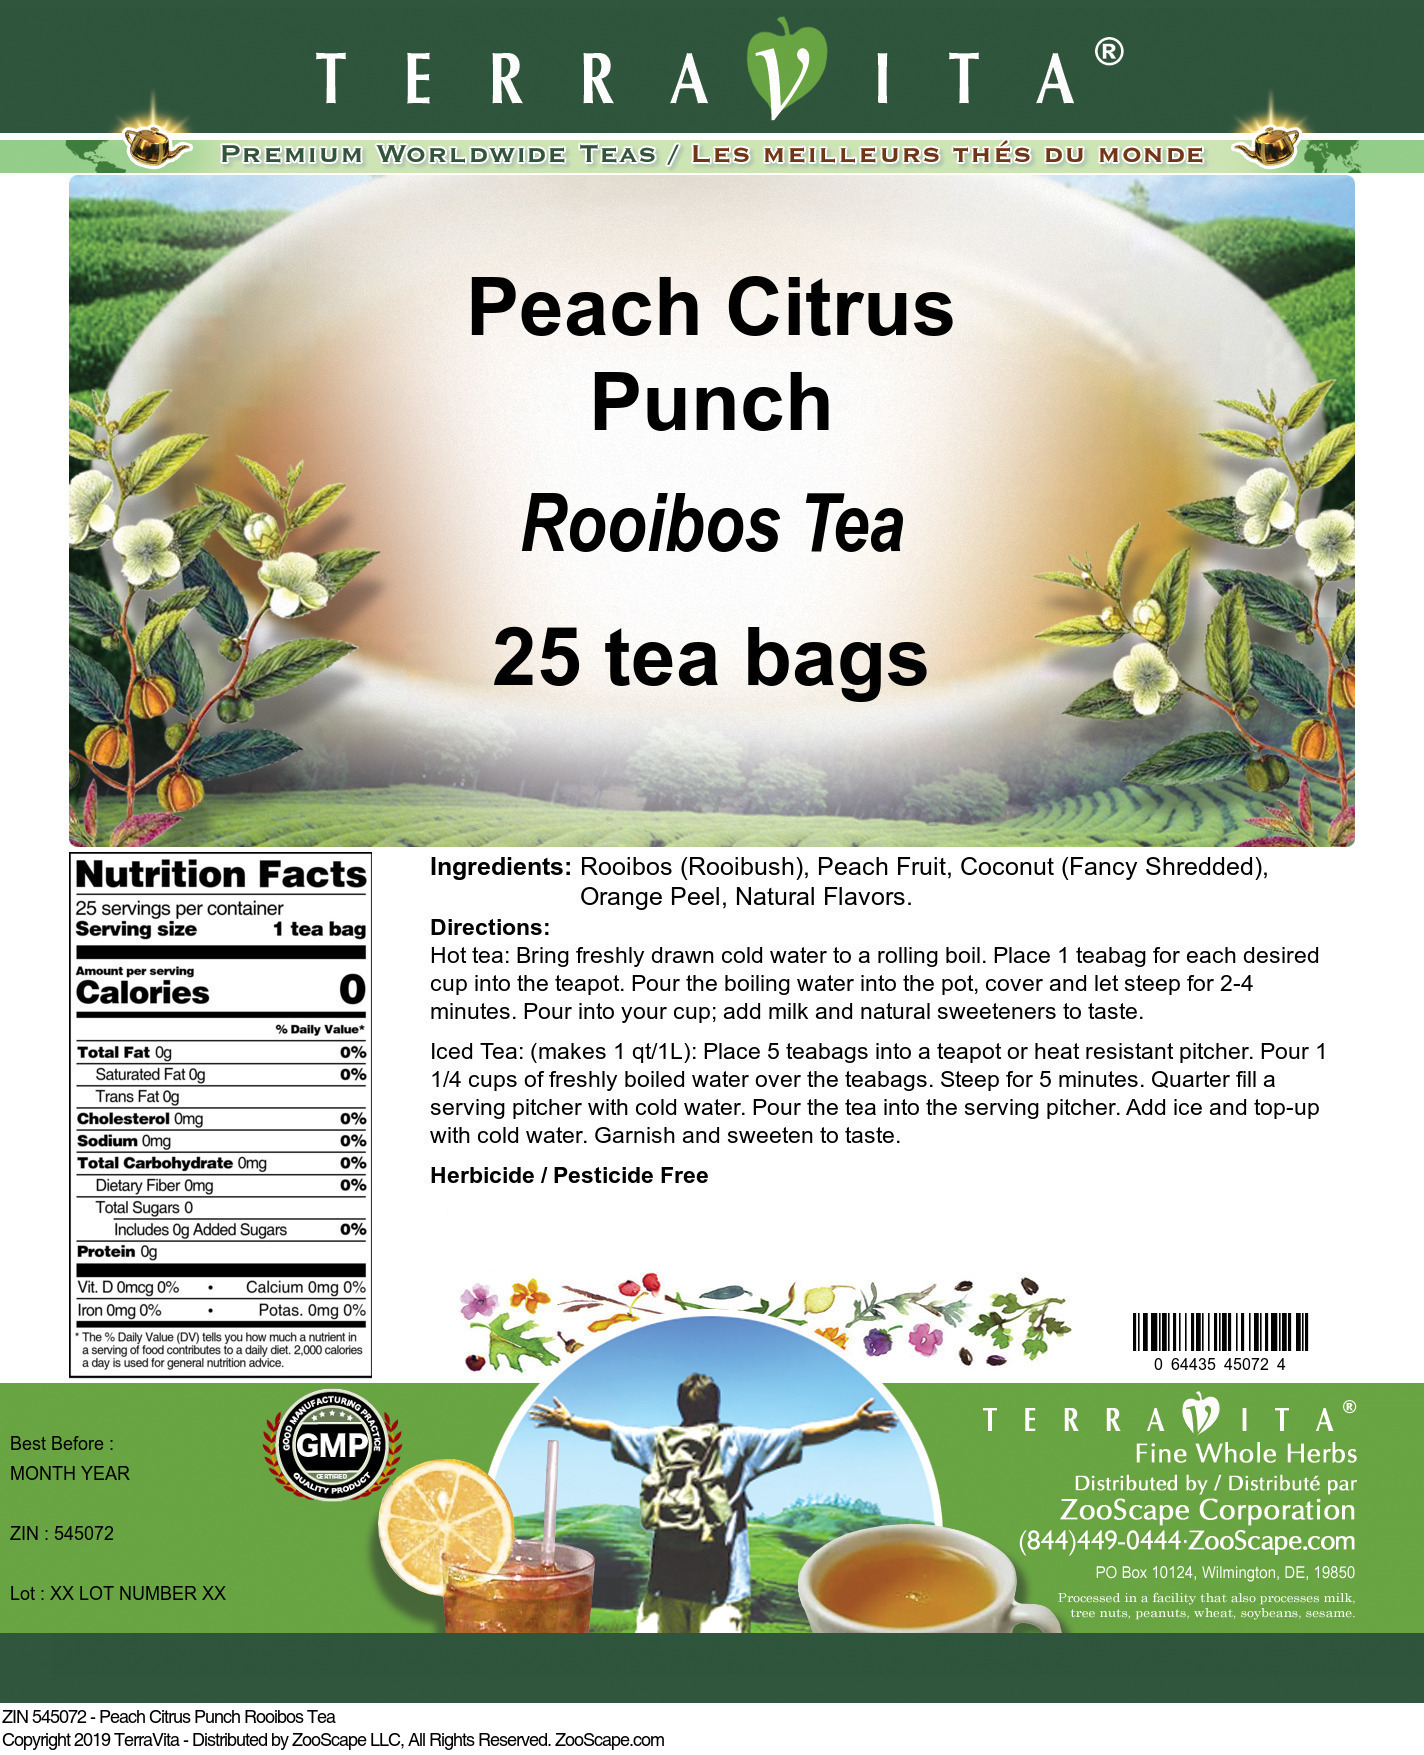 Peach Citrus Punch Rooibos Tea